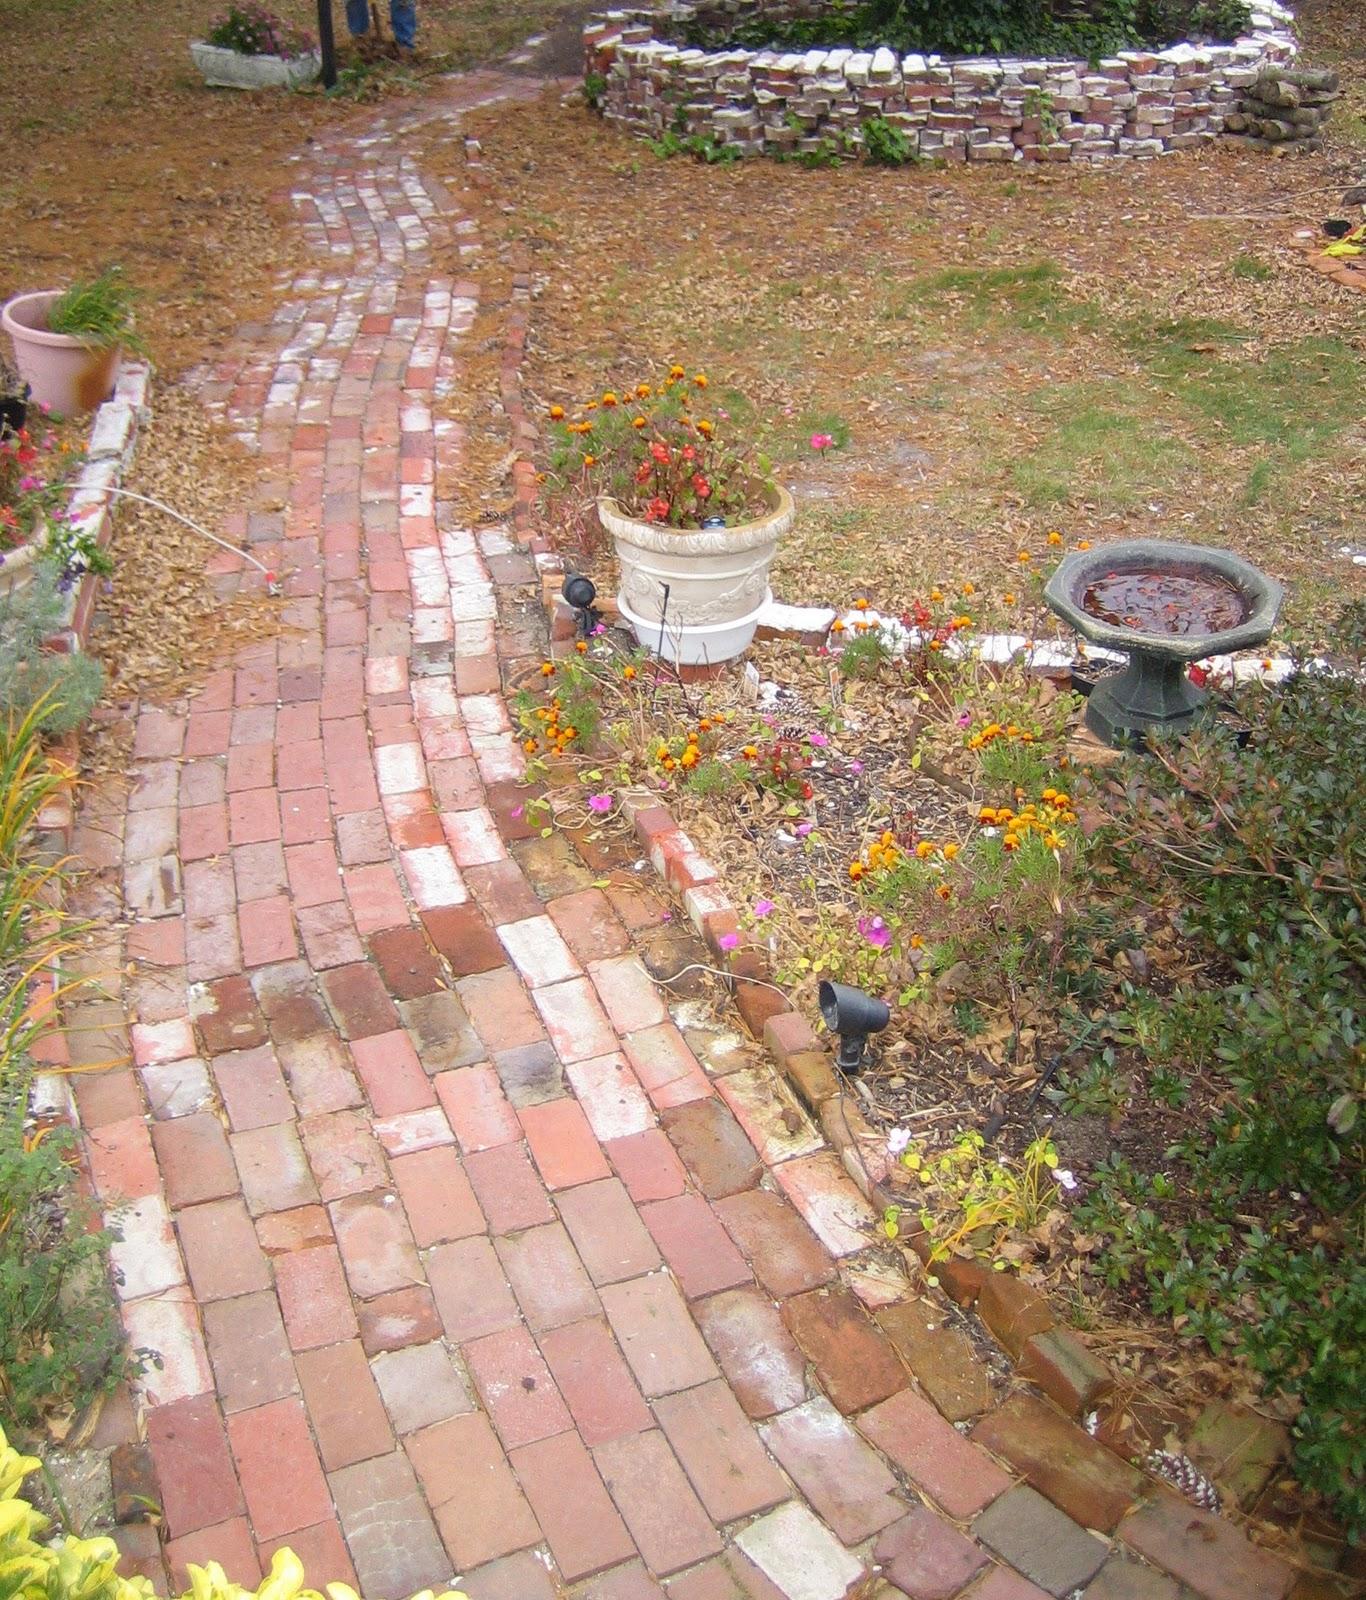 How to lay brick walkway - Brick Walkway Finished Brick Paths Dry Laid Brick Walkway